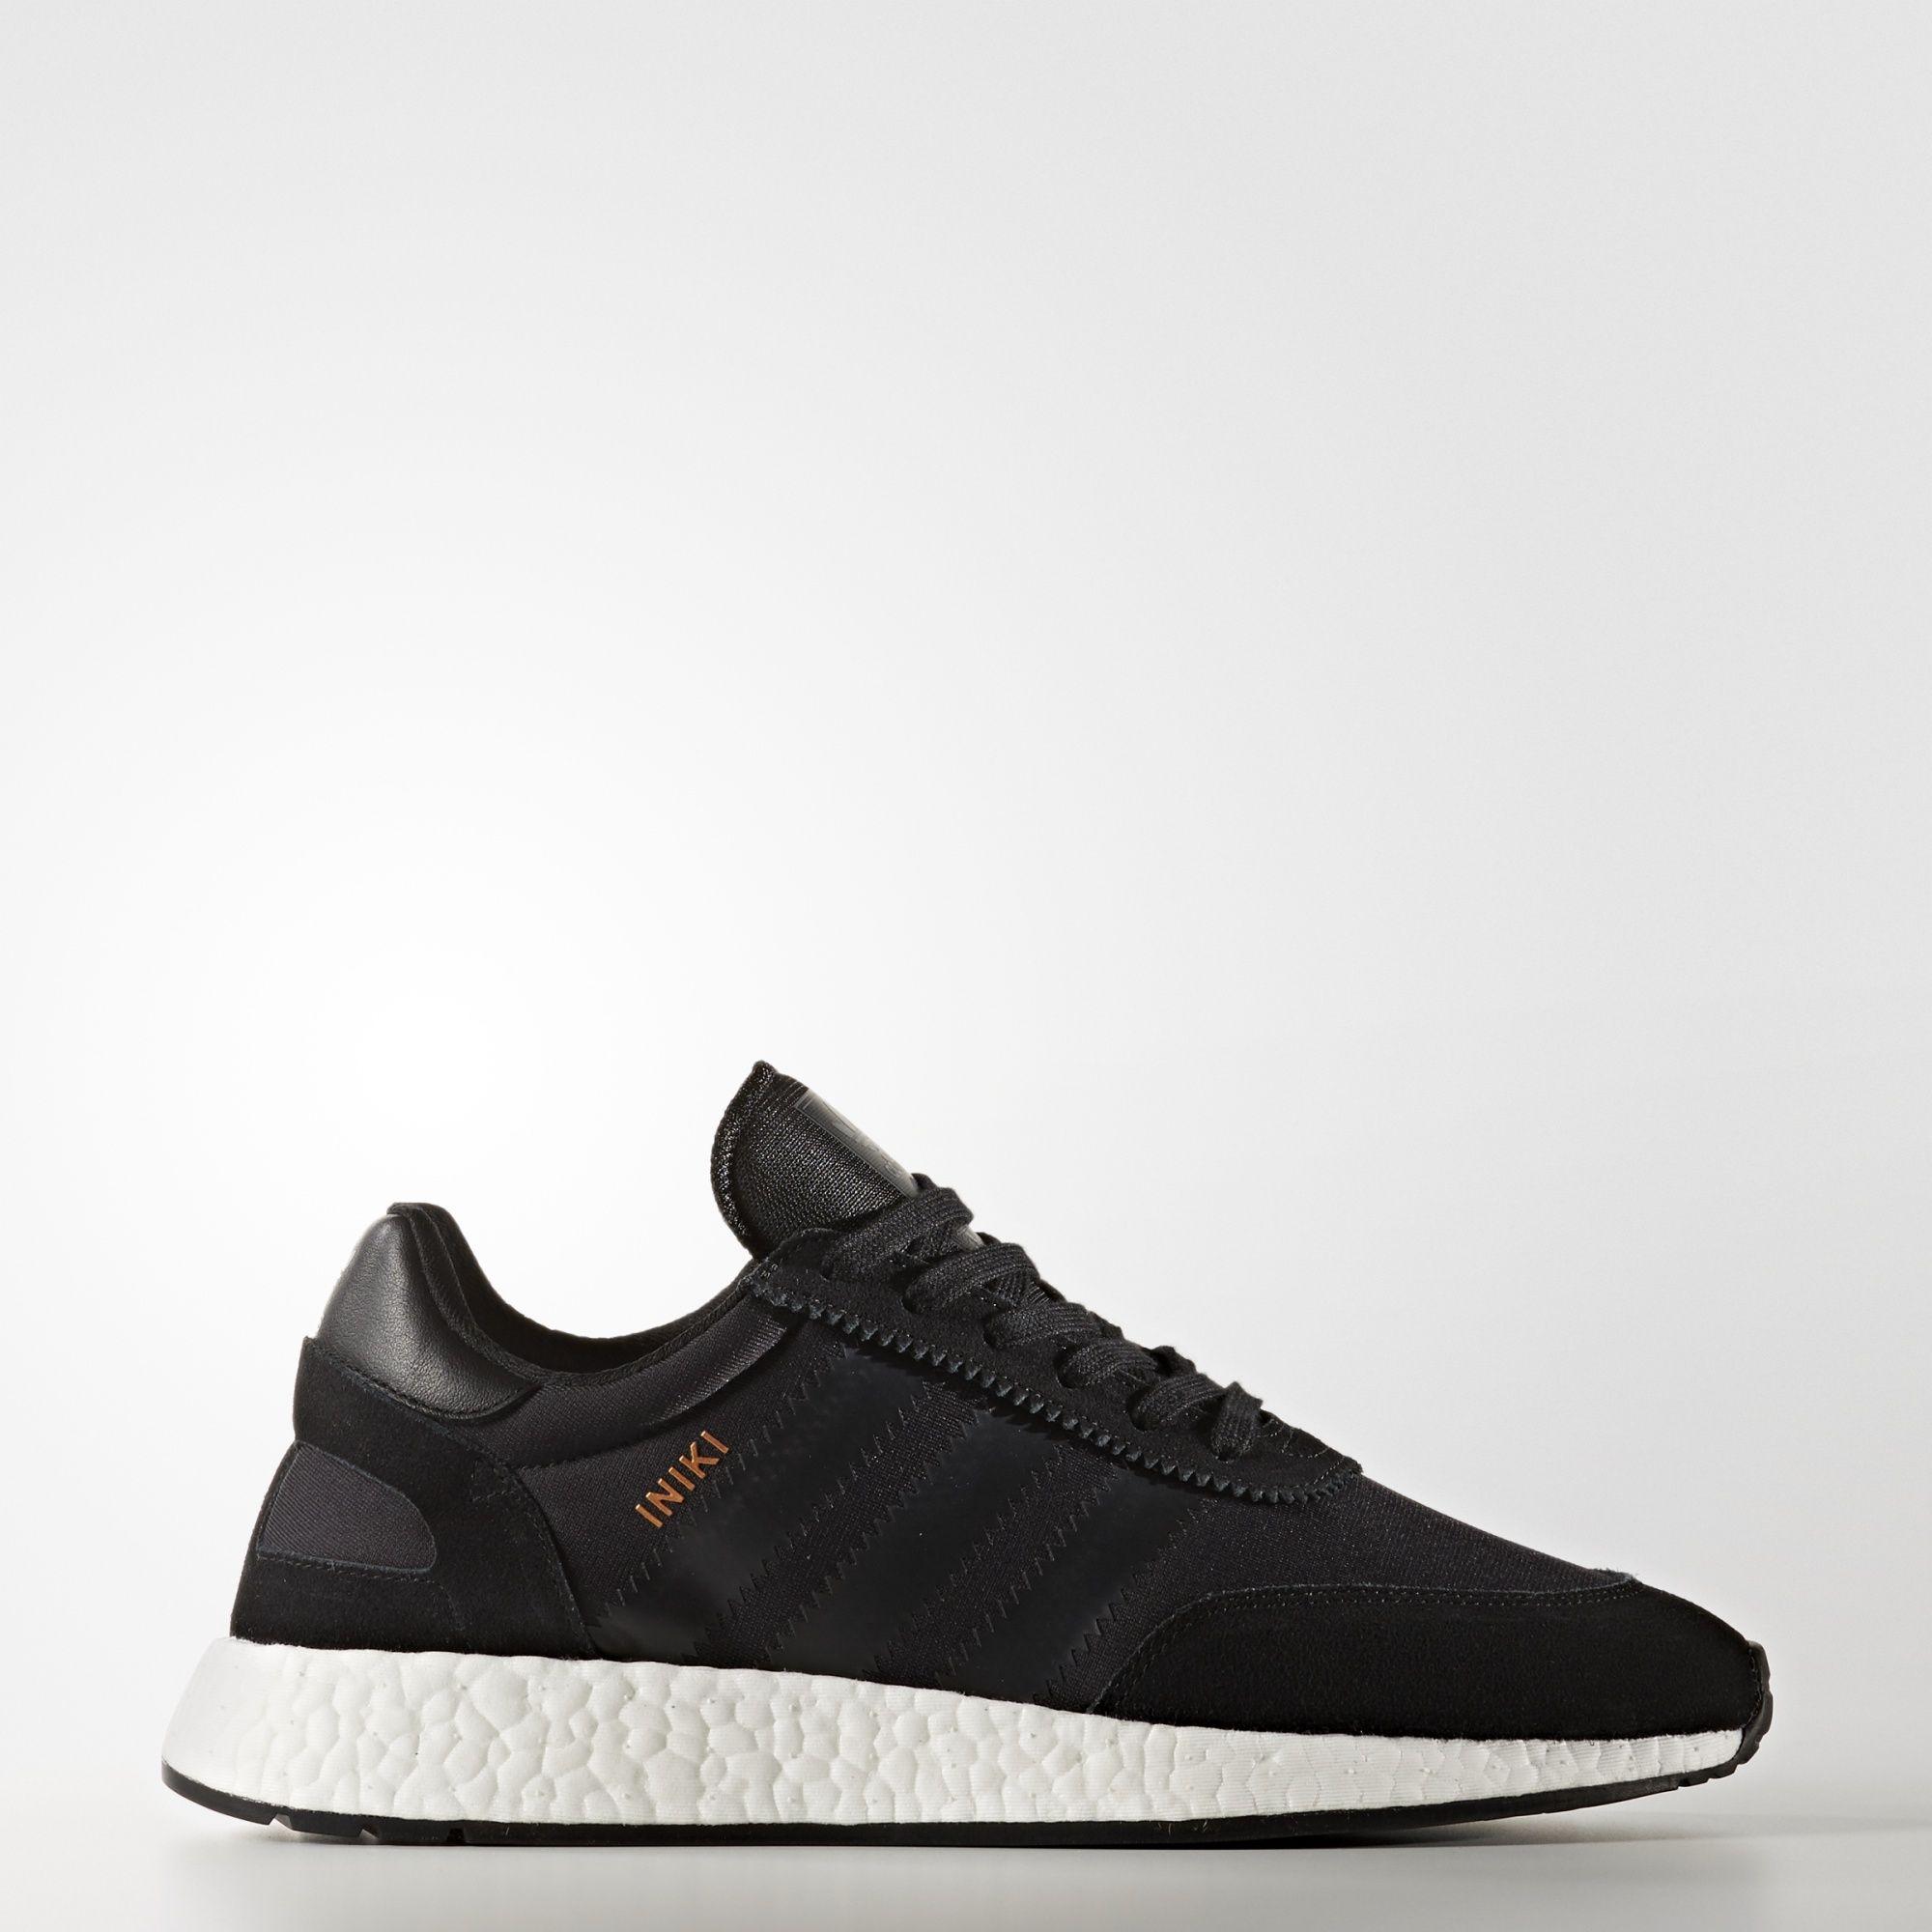 Core Black Iniki | Adidas iniki runner, Streetwear shoes, Adidas iniki